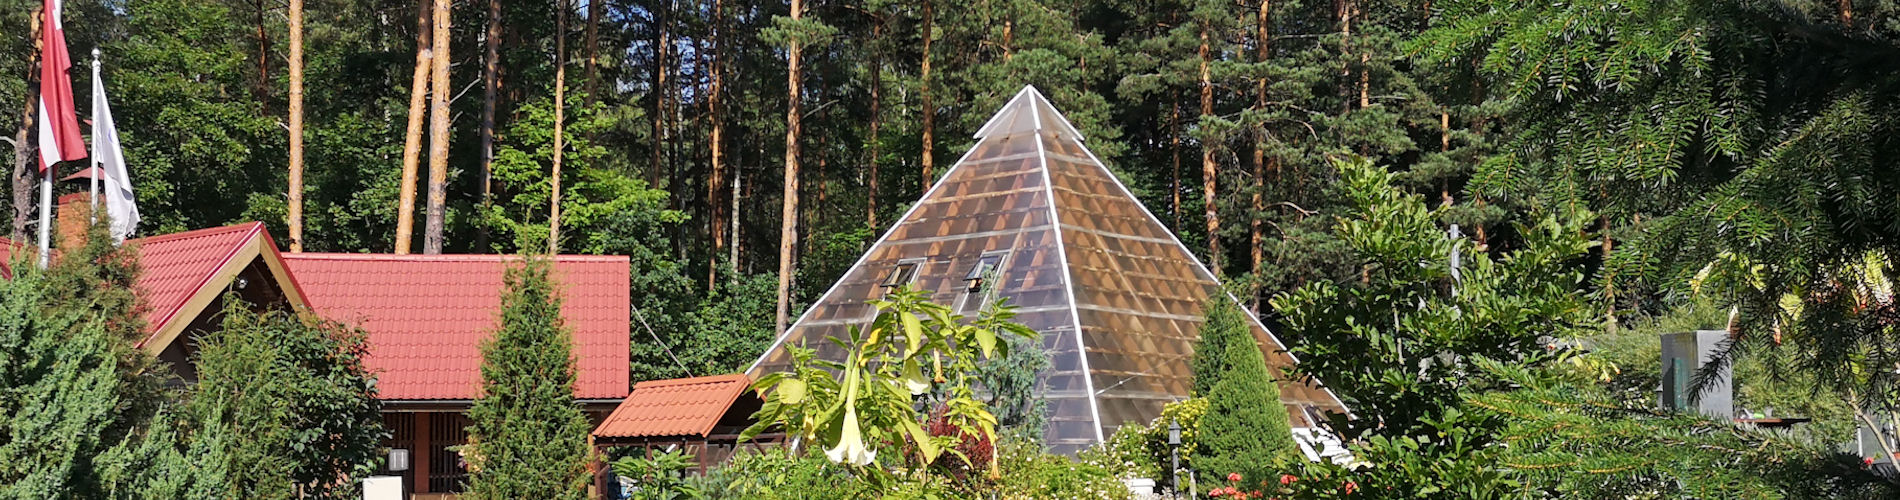 Garden House Viktorijas